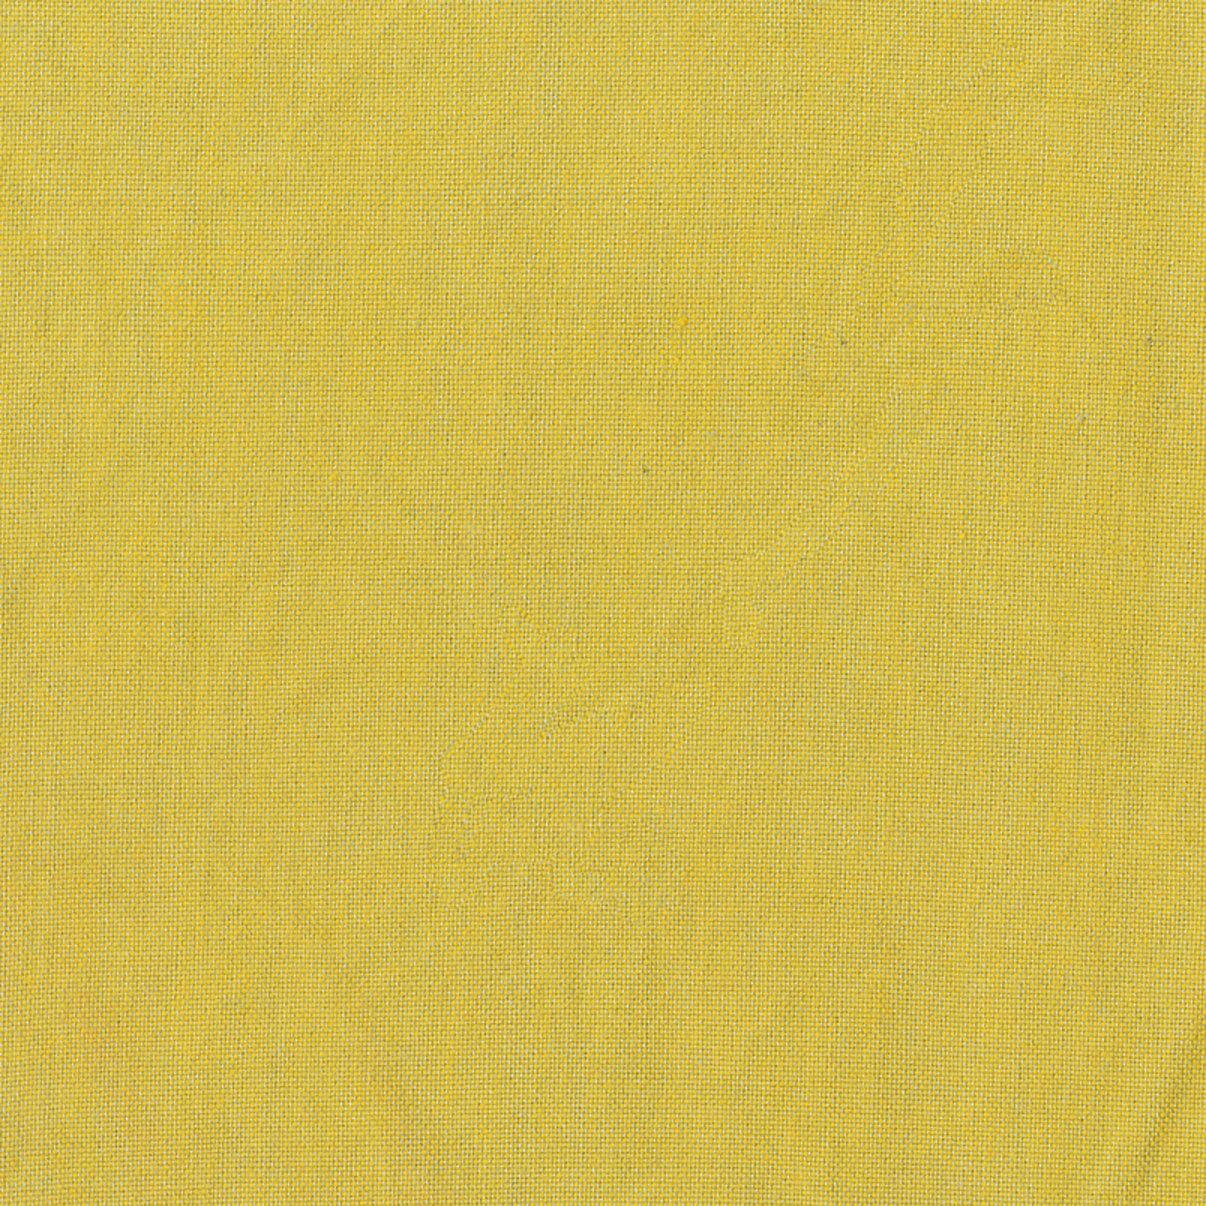 Windham Fabrics Artisan Solid (Yellow/Grey)